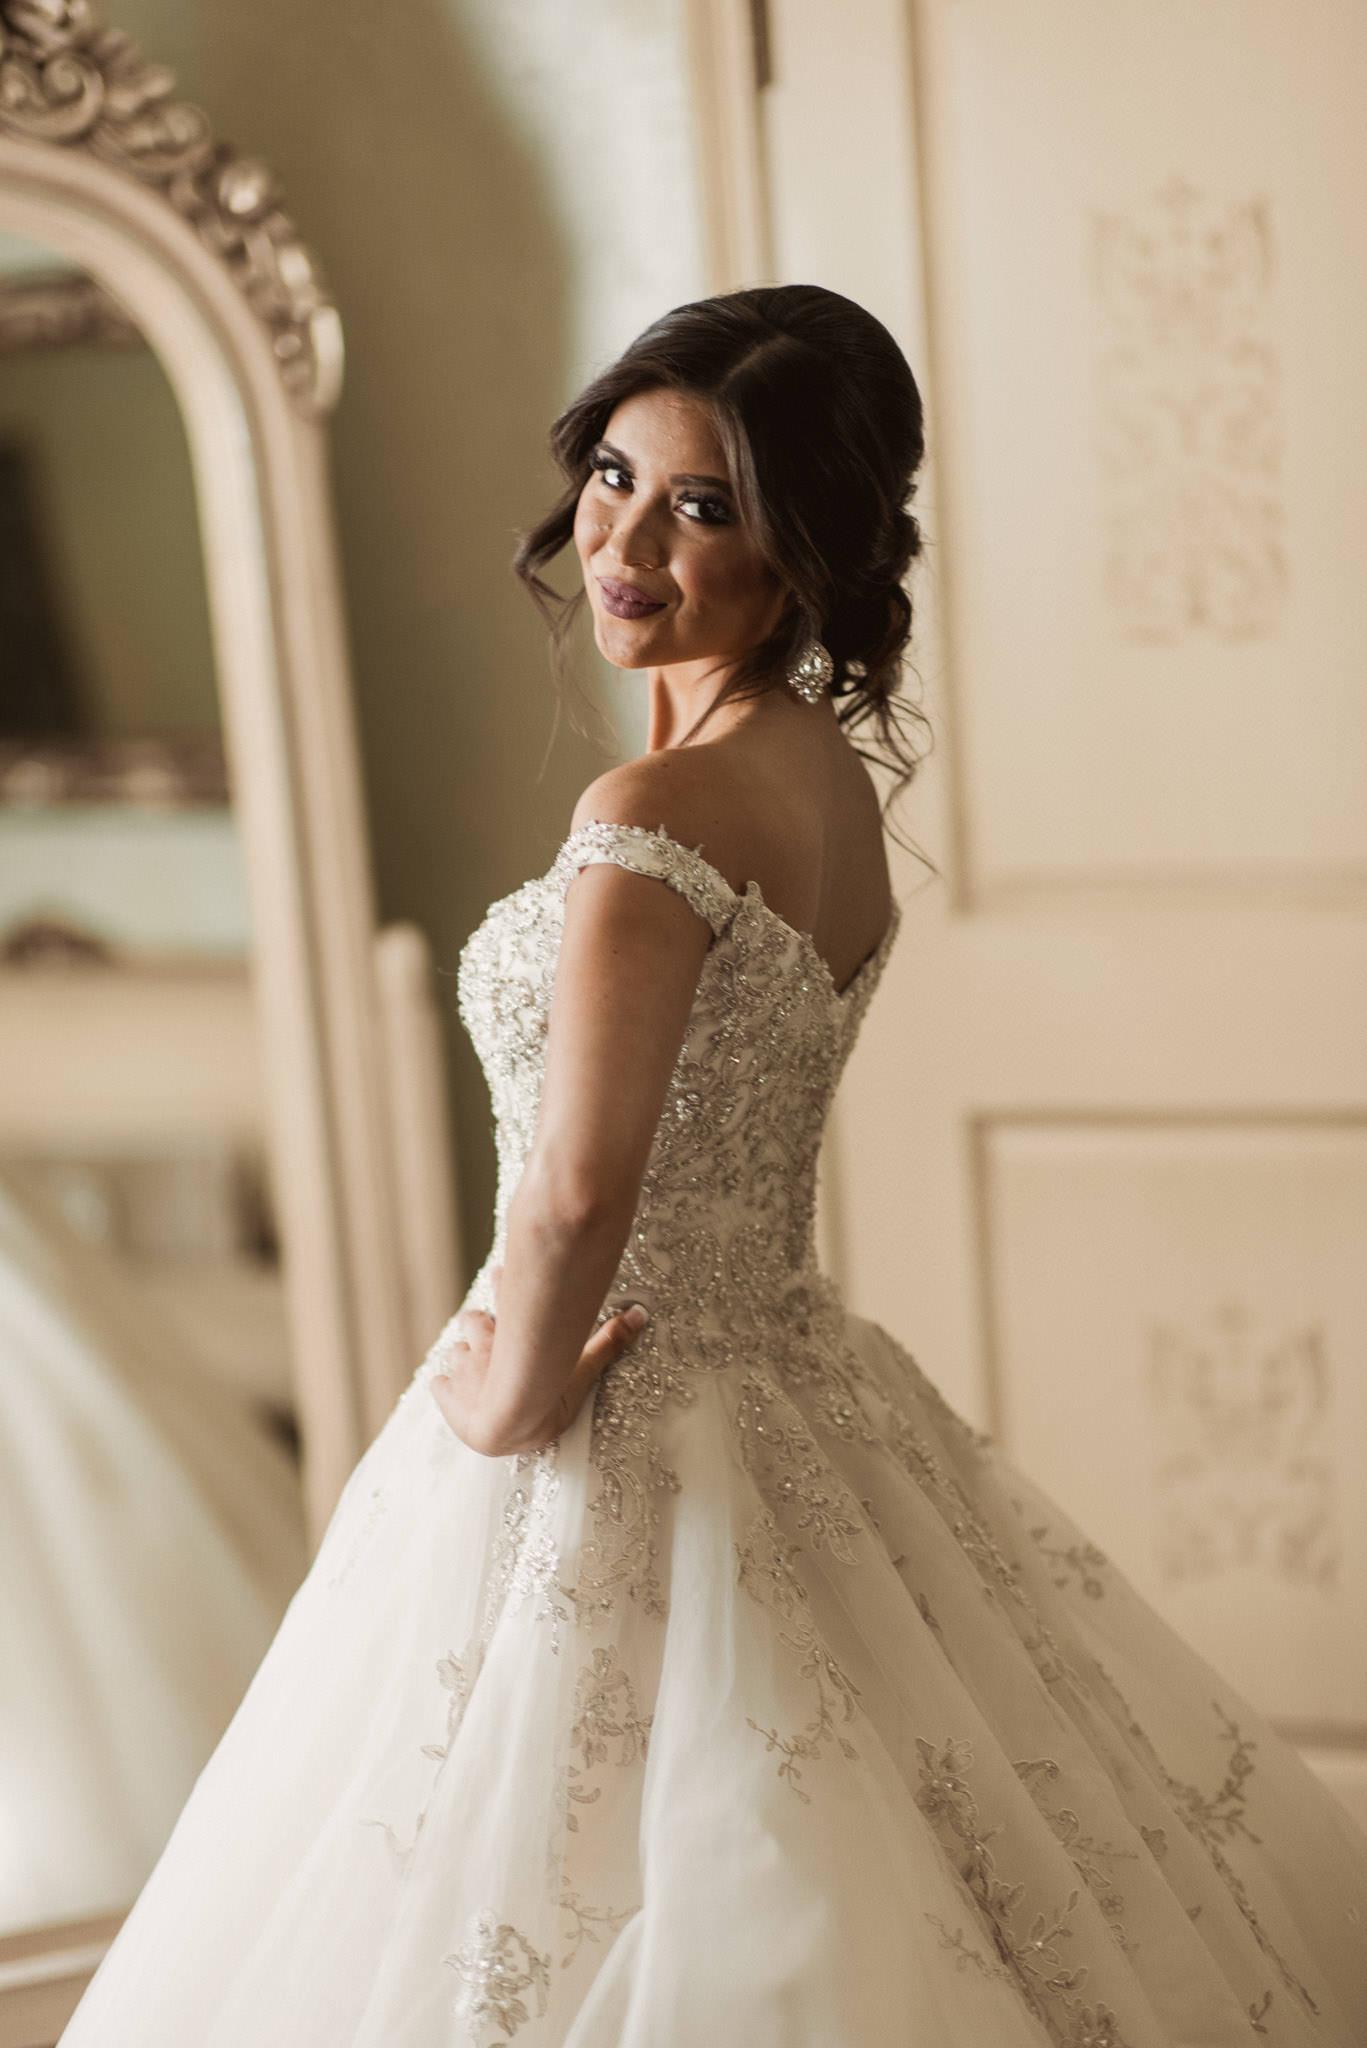 adriana-christian-wedding-re-sm-30.jpg